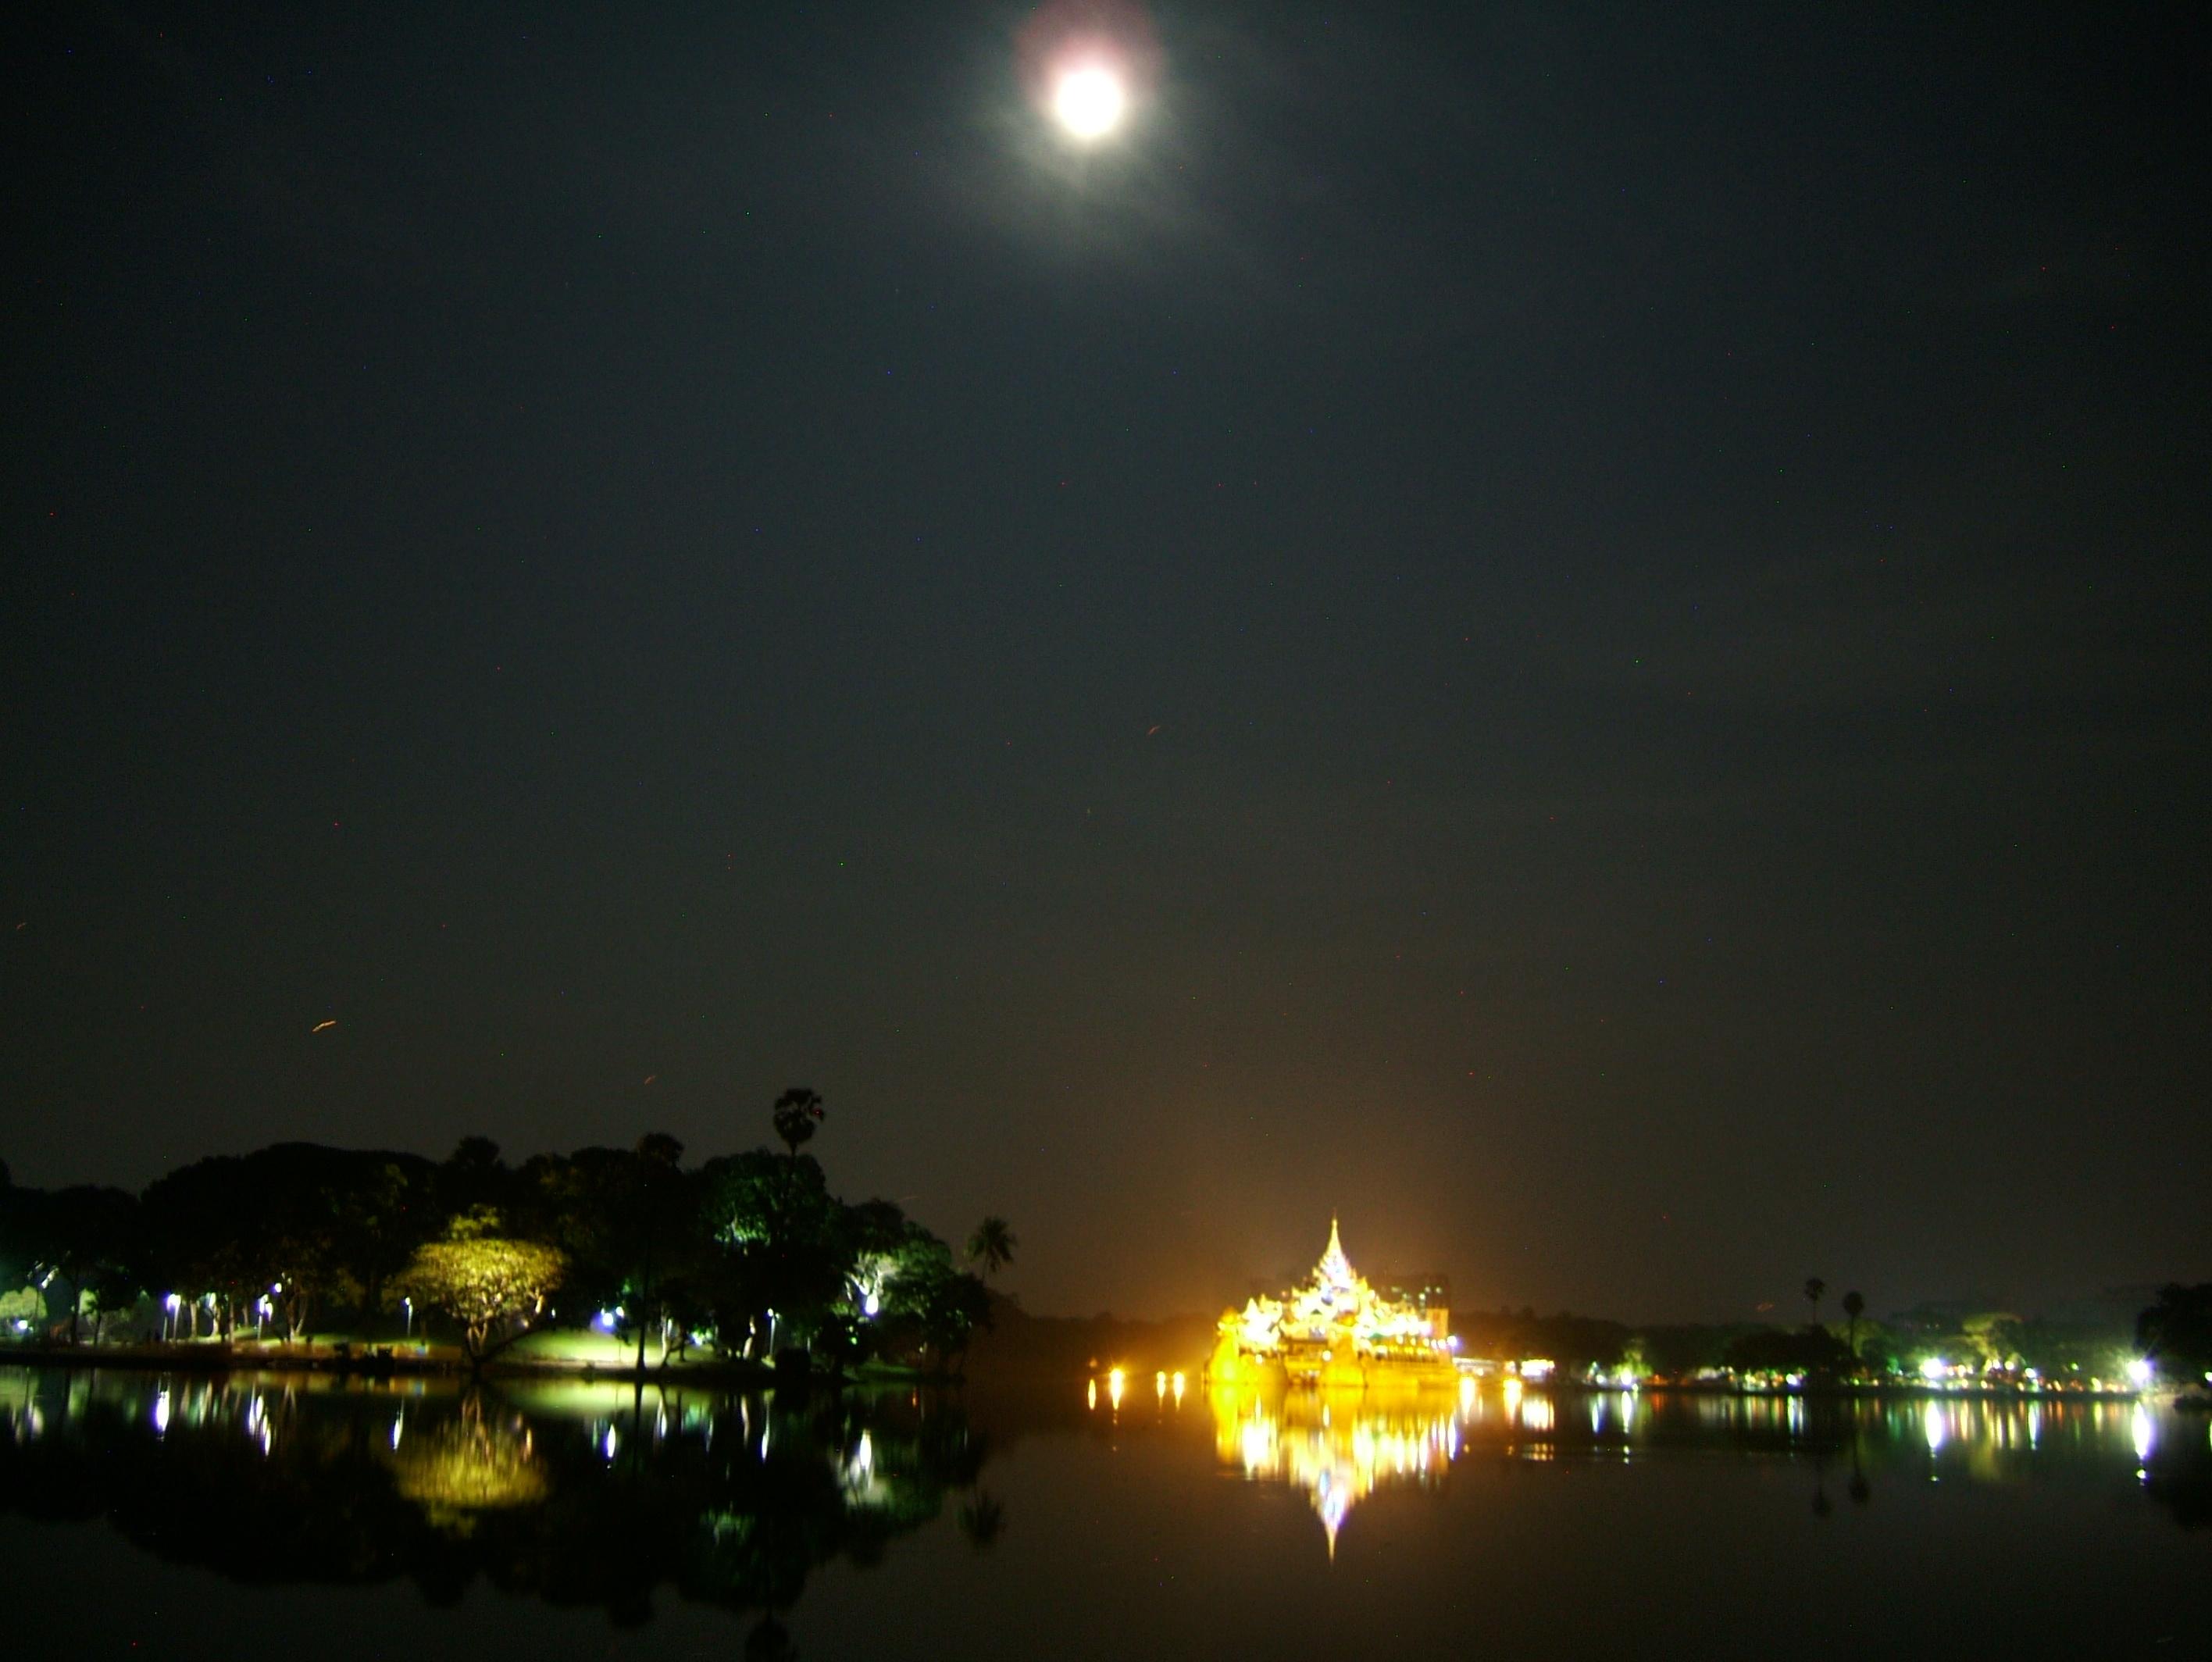 Myanmar Yangon Kandawgyi Palace Hotel royal barge Nov 2004 06